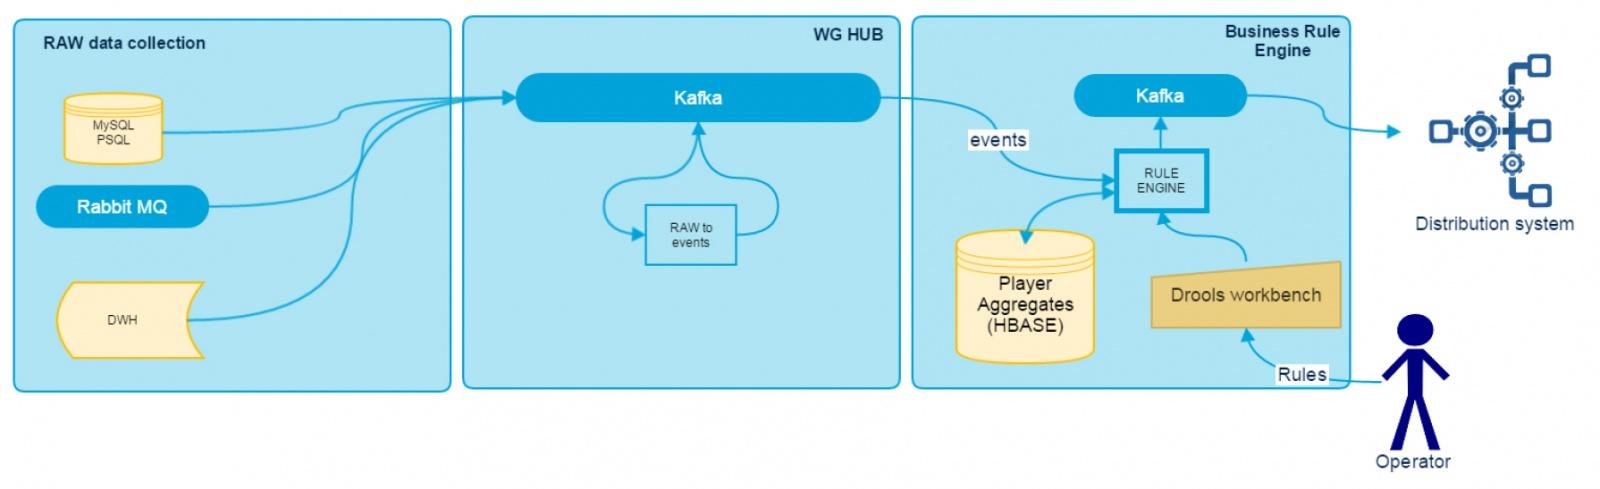 Data Driven Realtime Rule Engine в Wargaming: анализ данных. Часть 2 - 1